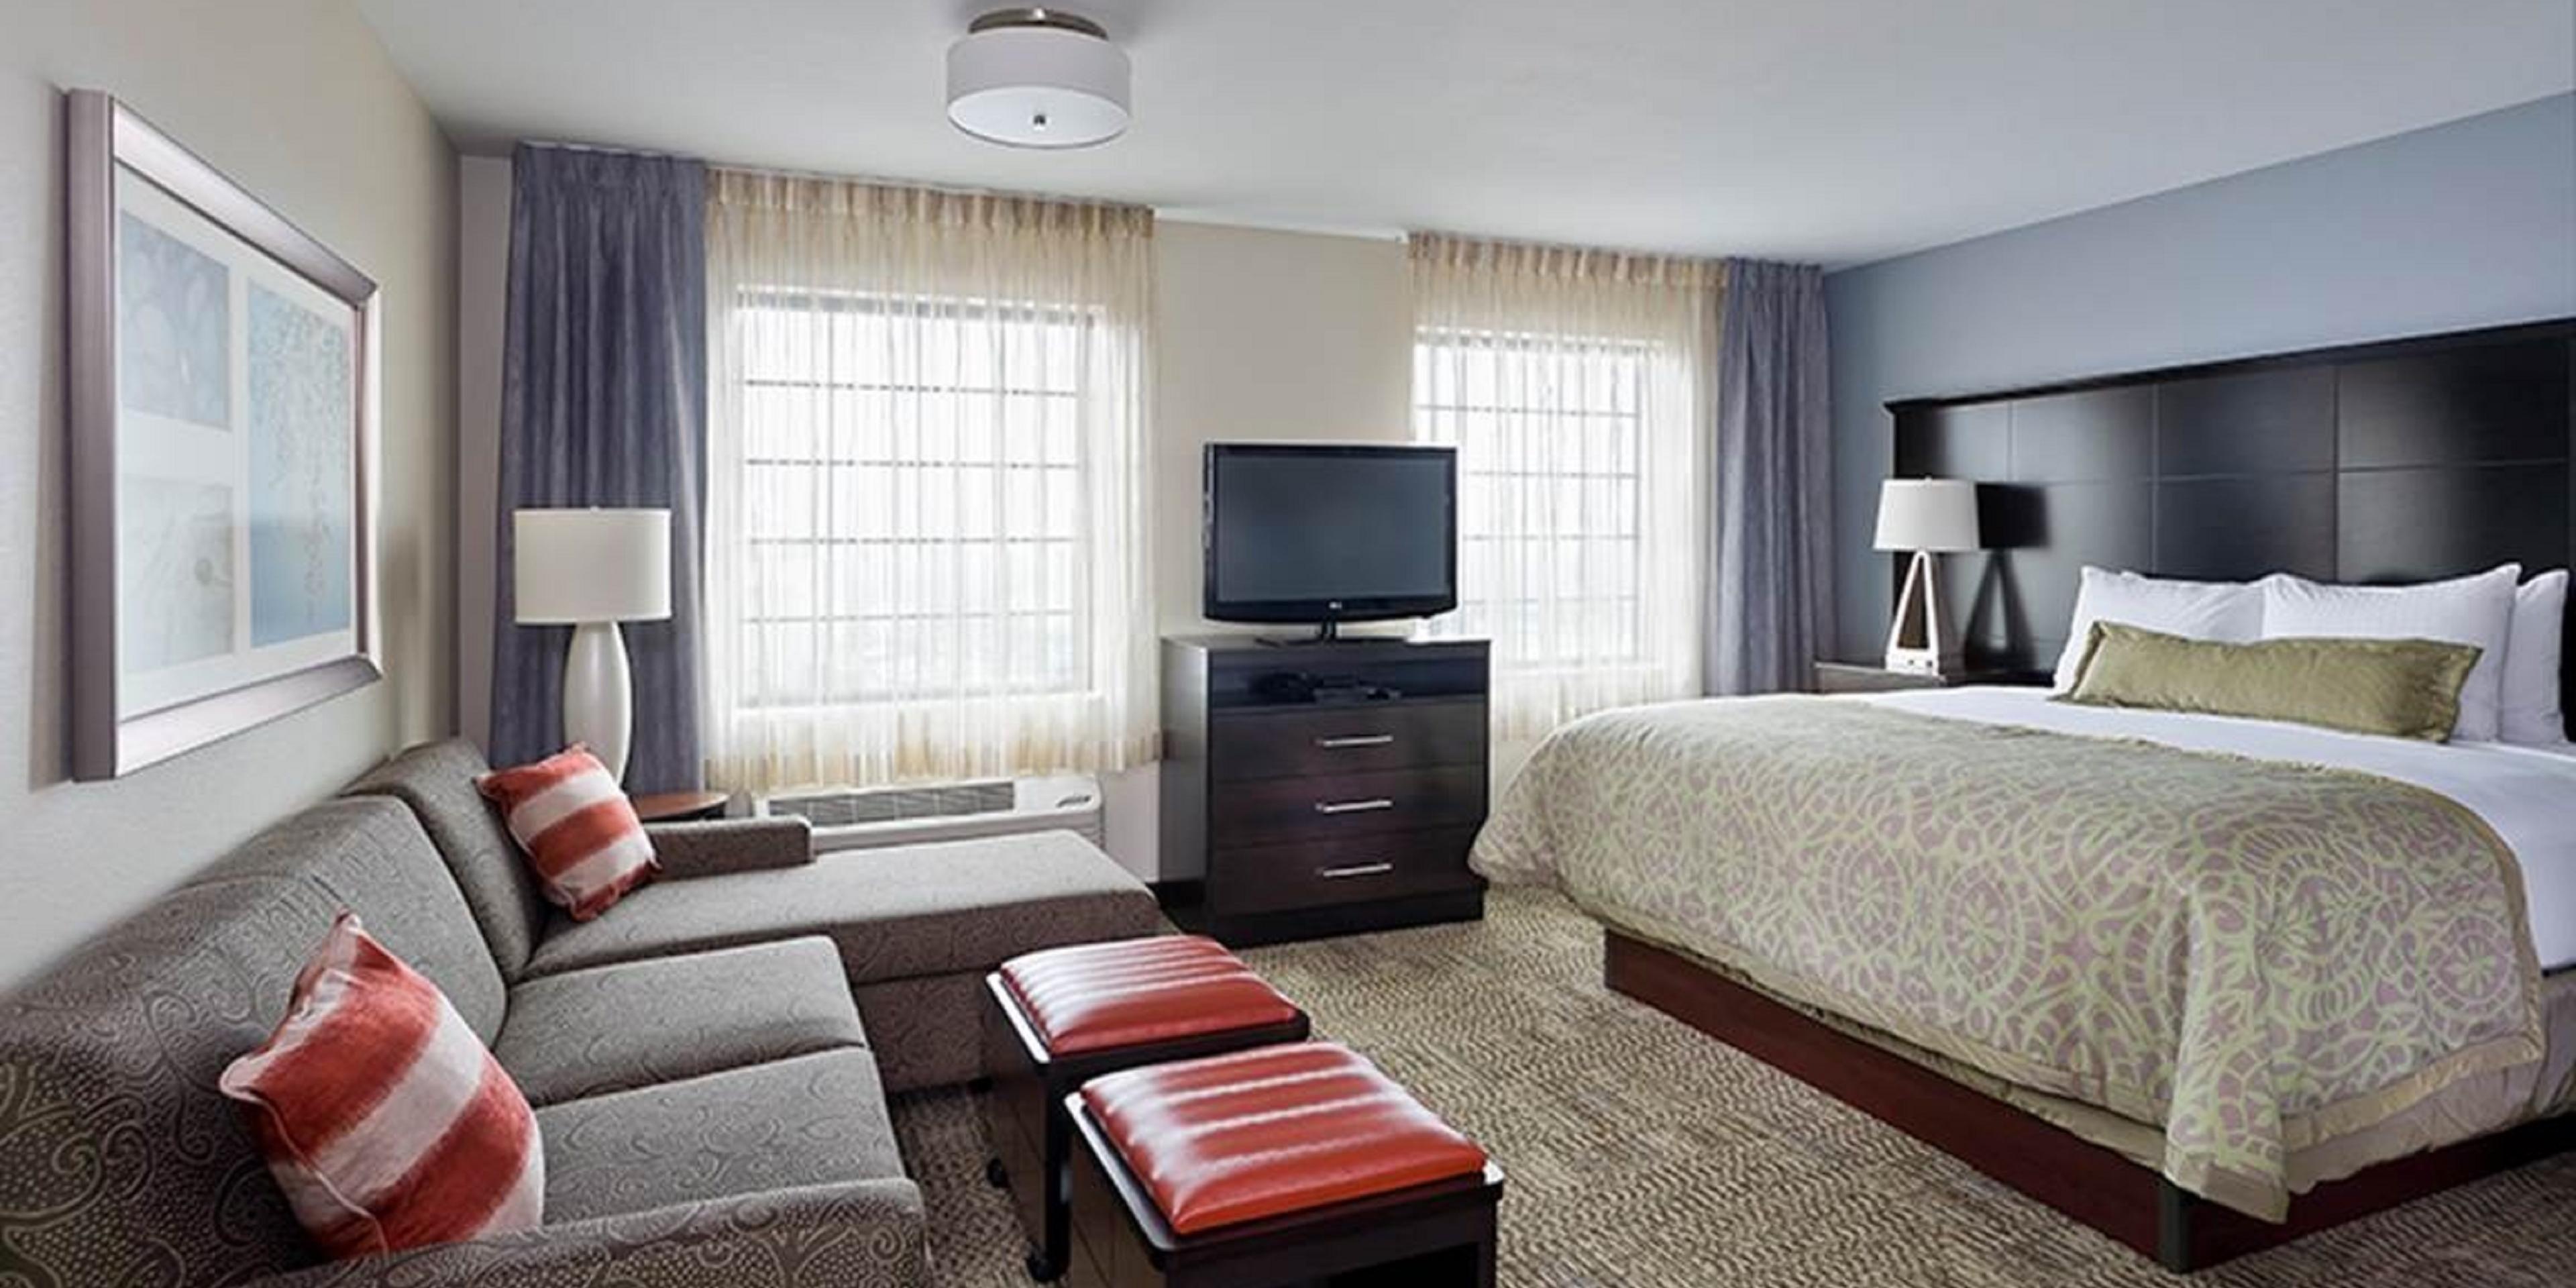 Staybridge Suites Philadelphia- Montgomeryville image 1